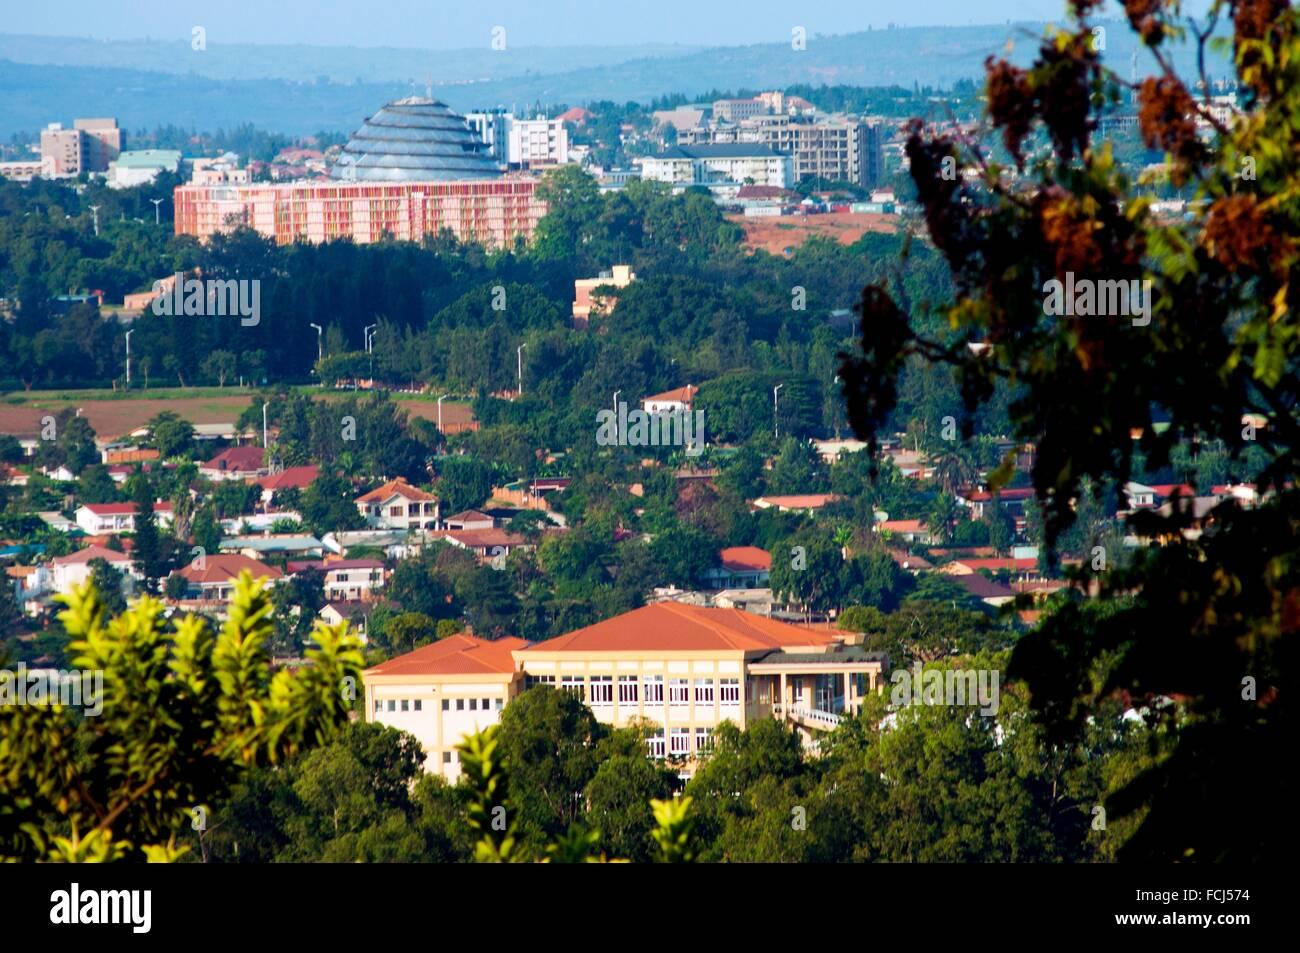 View of southeastern suburbs from KN 7 Avenue, Kigali, Rwanda - Stock Image